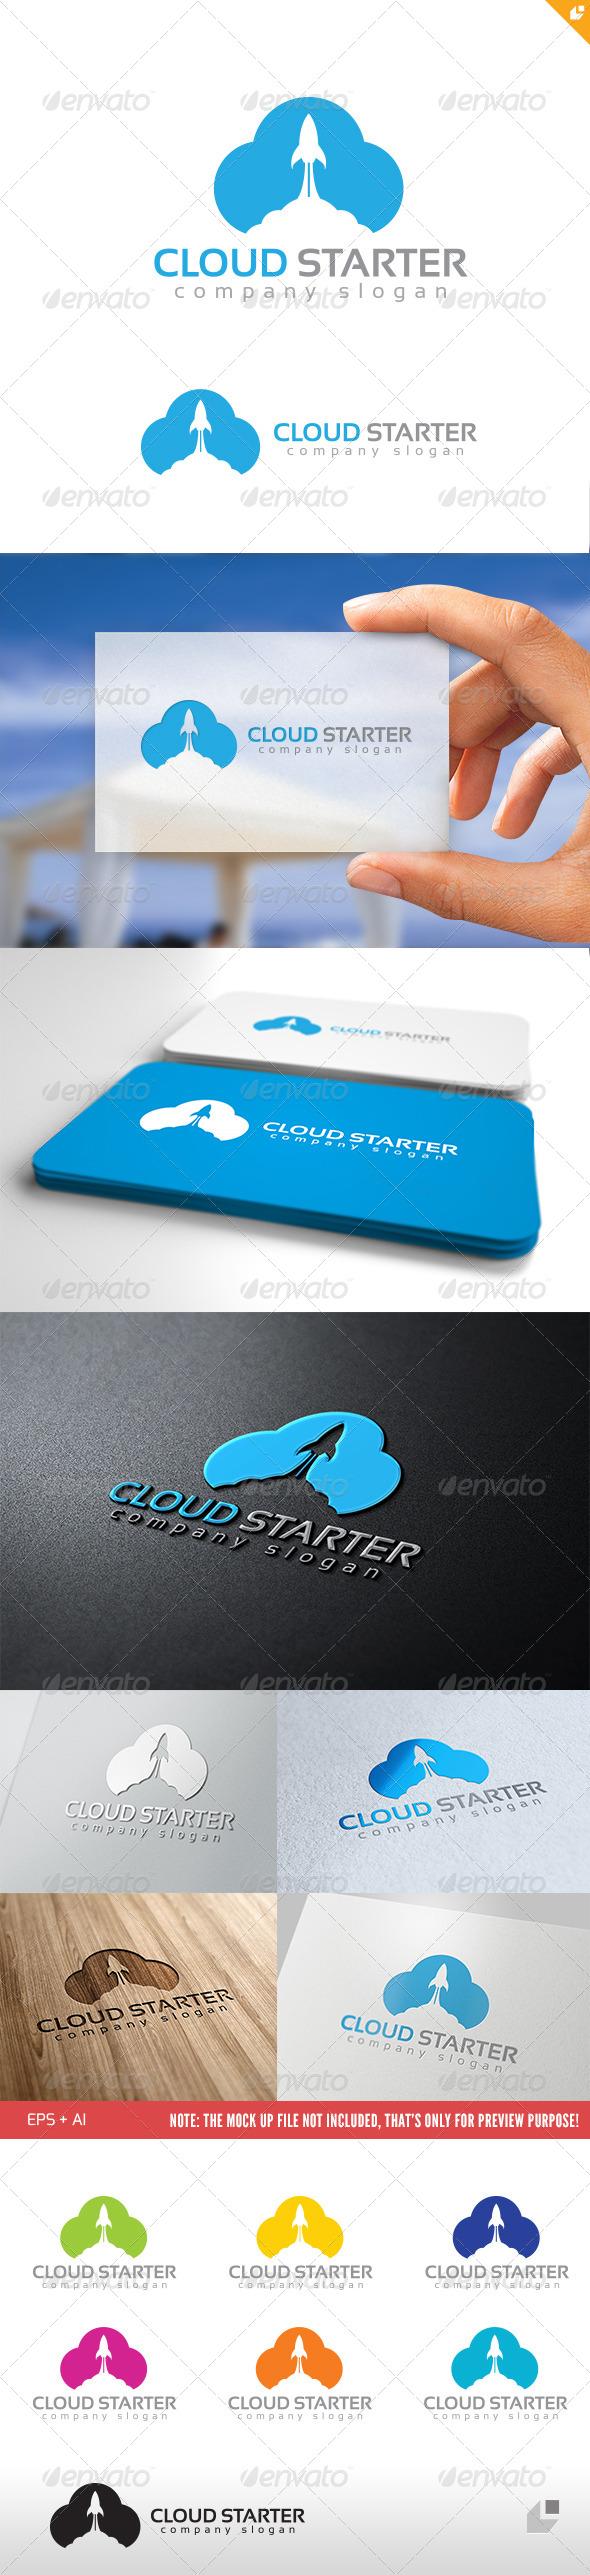 GraphicRiver Cloud Starter Logo 4702377